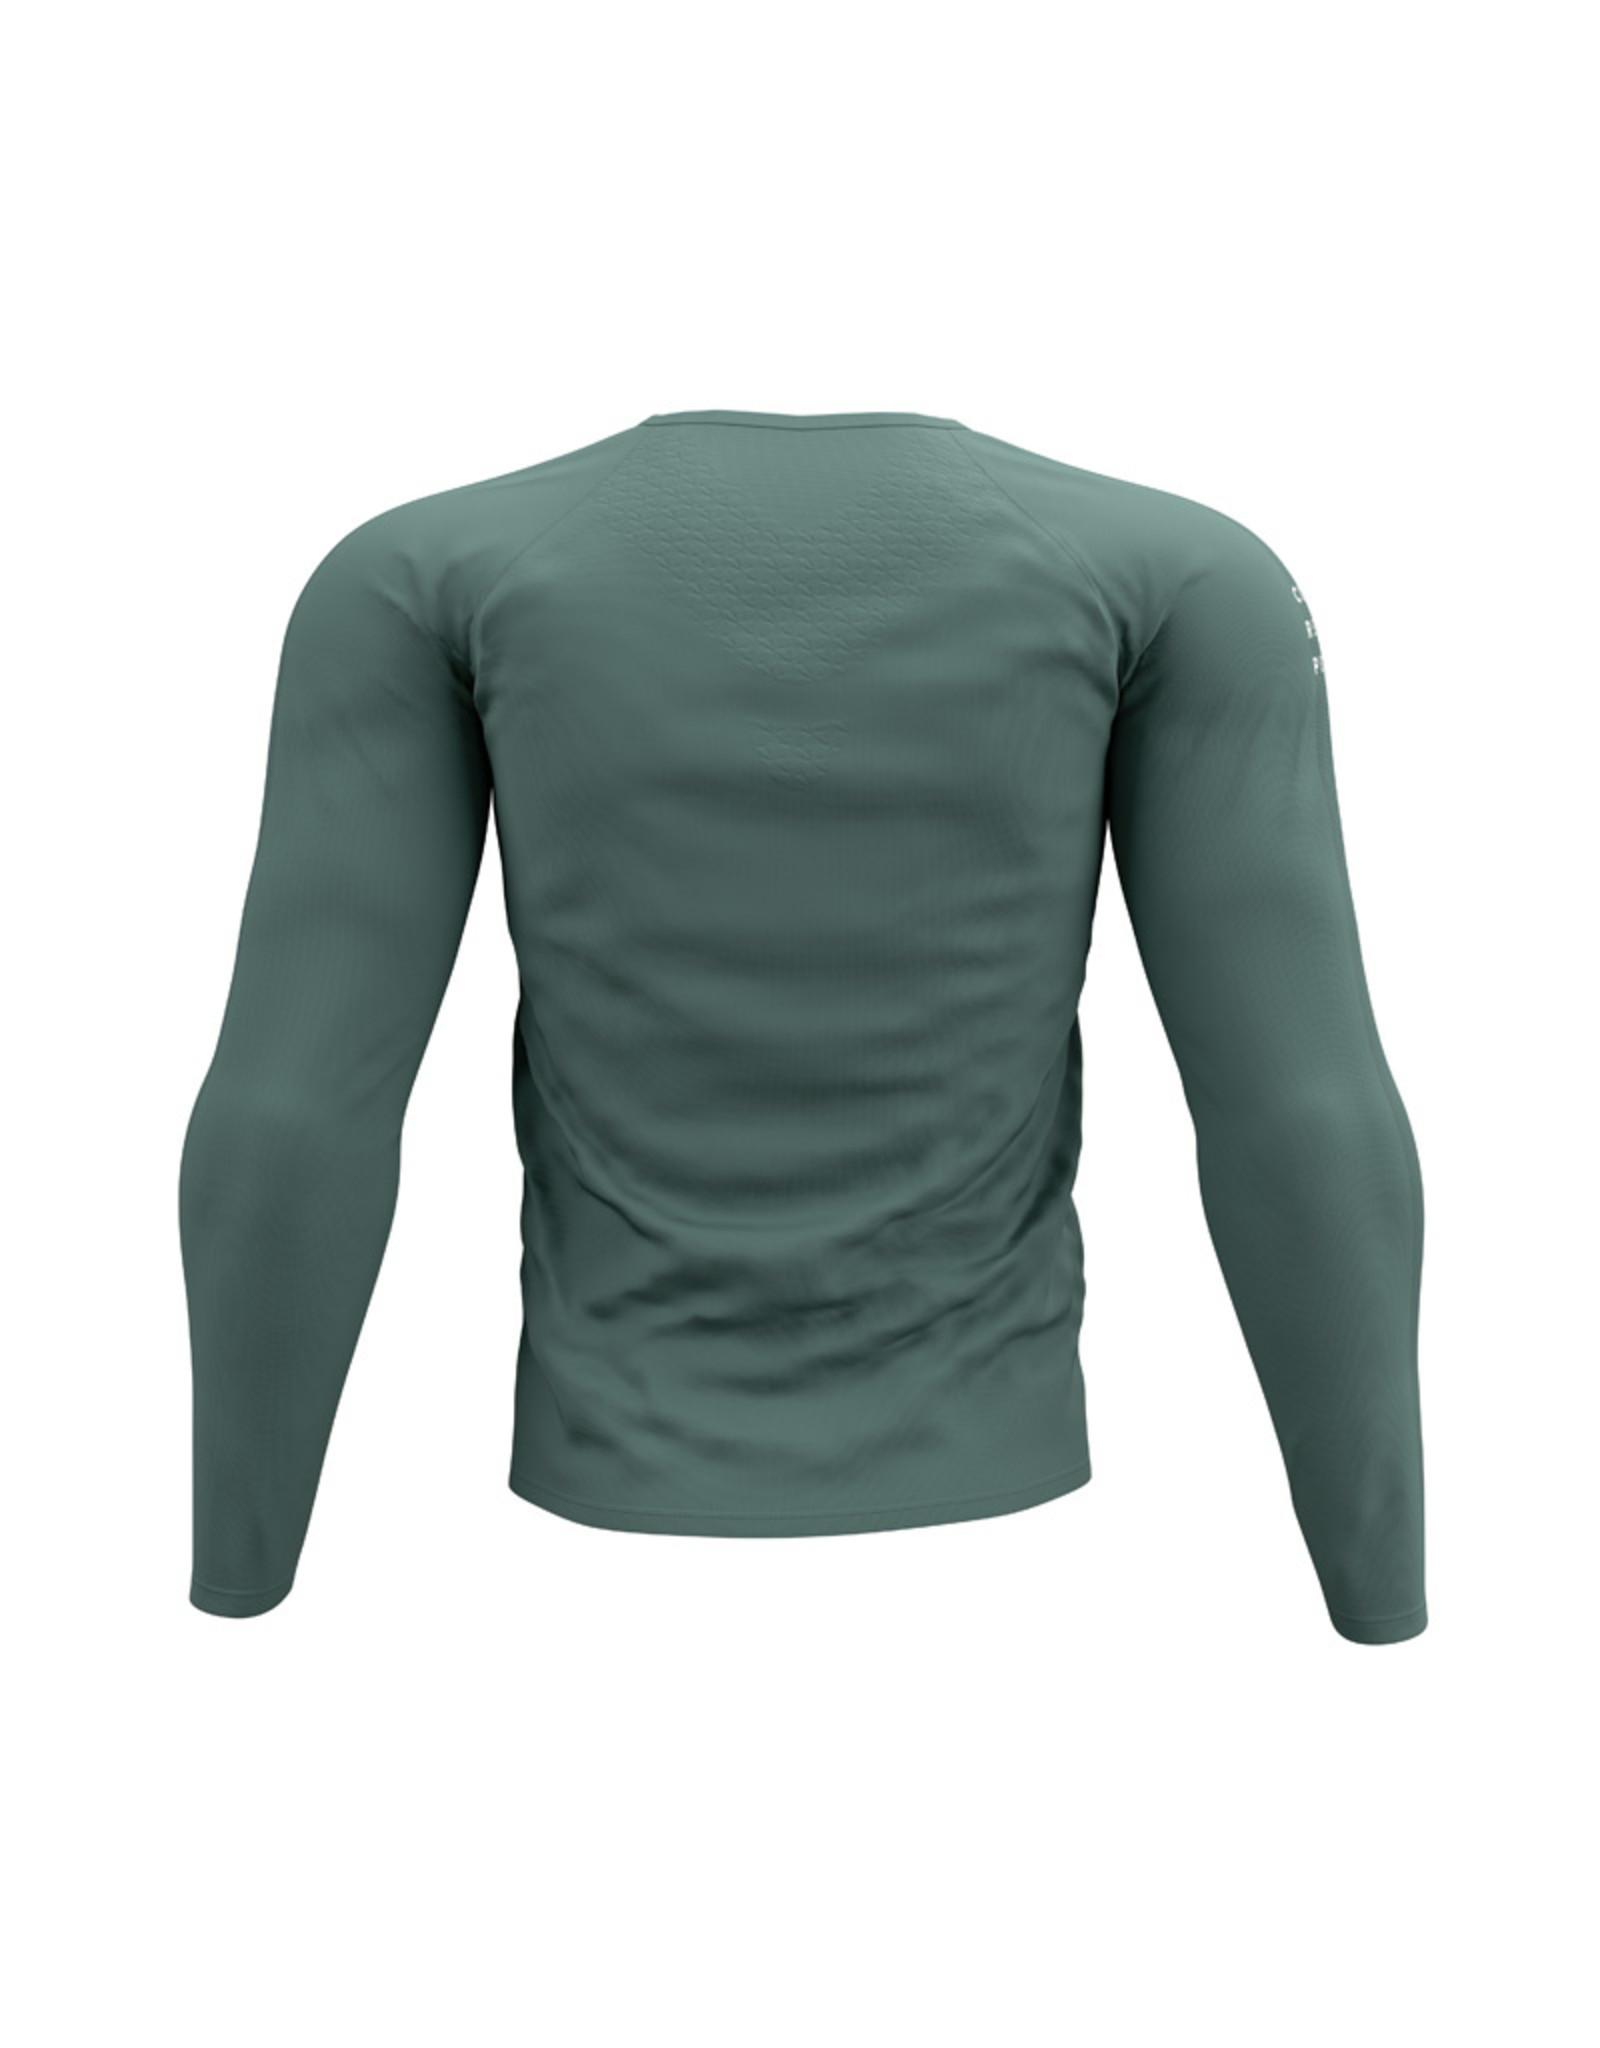 Compressport Training Tshirt LS  Groen Hardloopshirt Lange Mouw